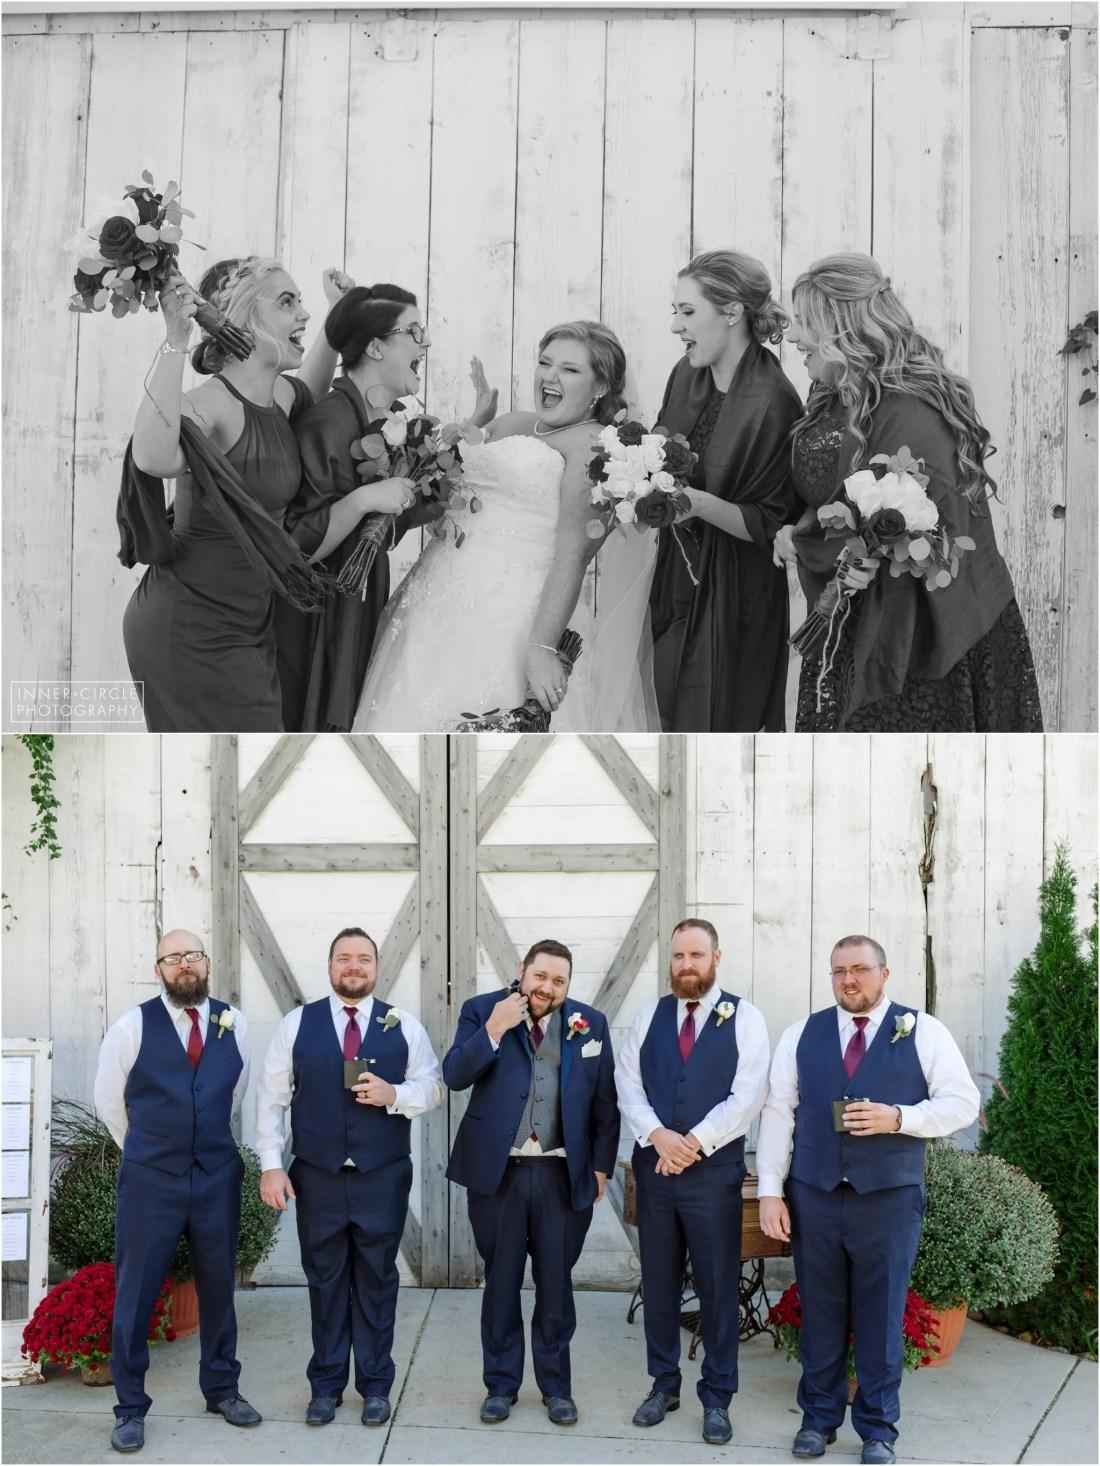 chrislauren_WED_InnerCirclePhoto_223 Chris + Lauren :: MARRIED!